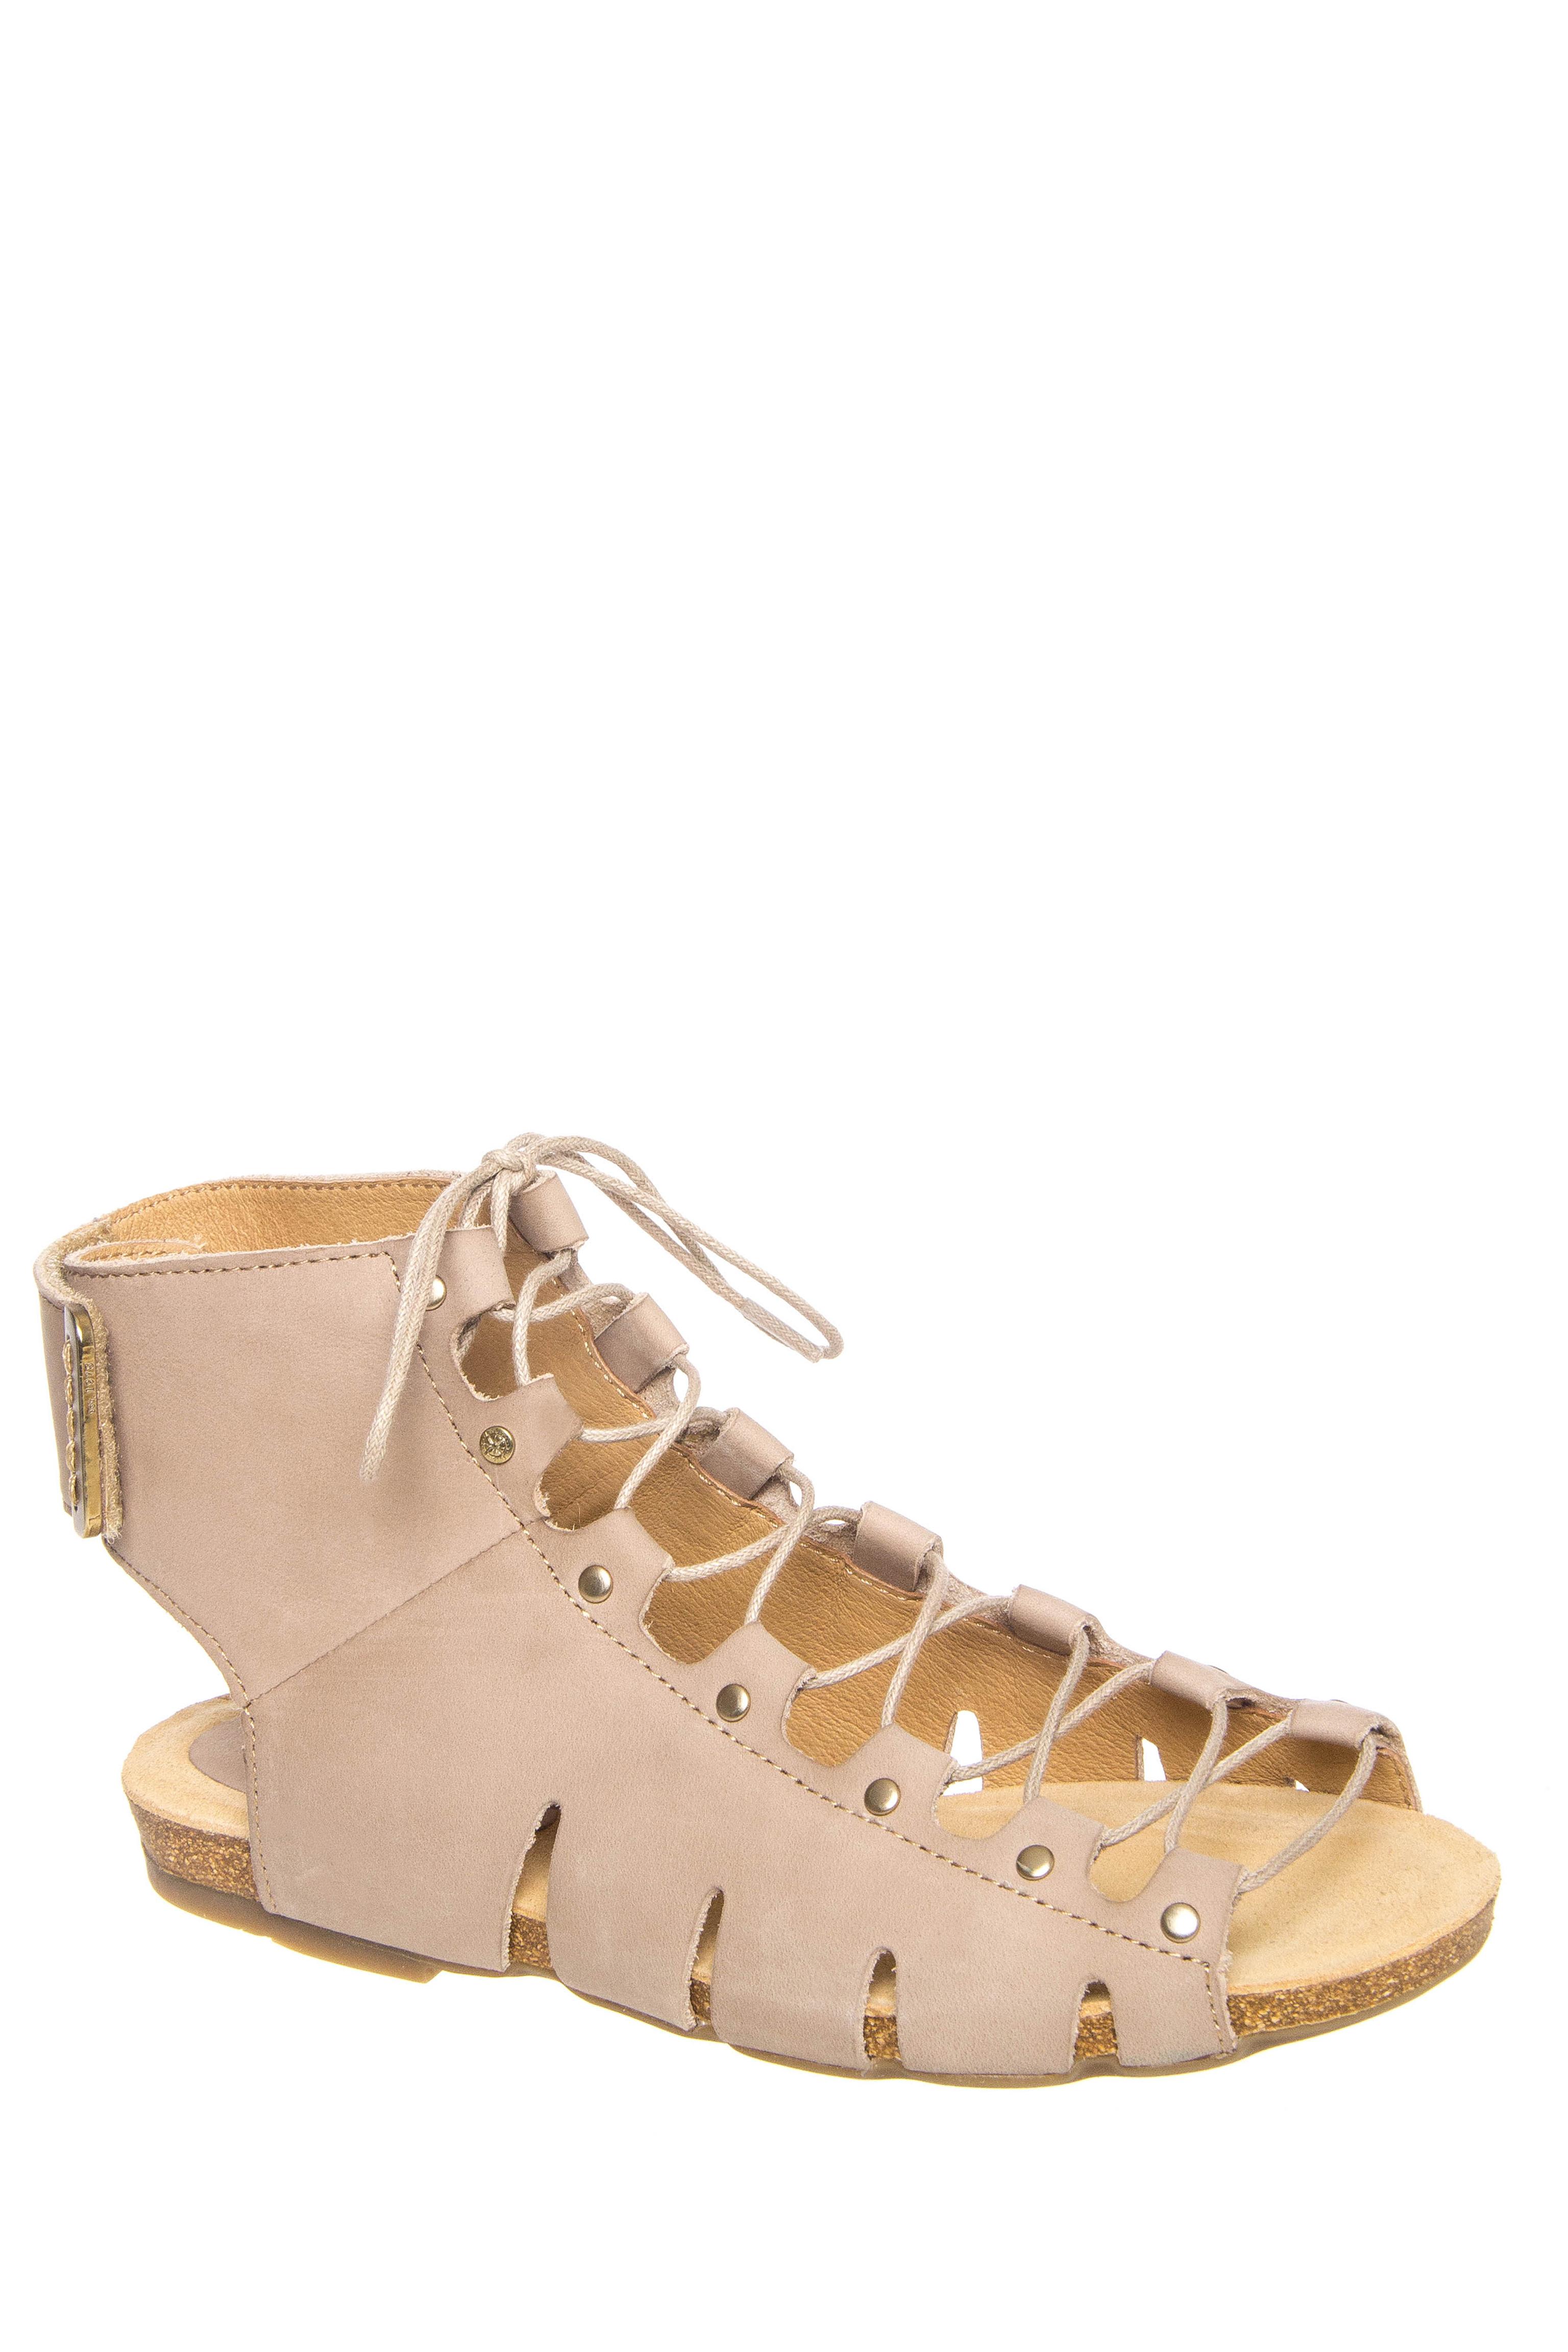 Bussola Maynila Gladiator Sandals - Doeskin